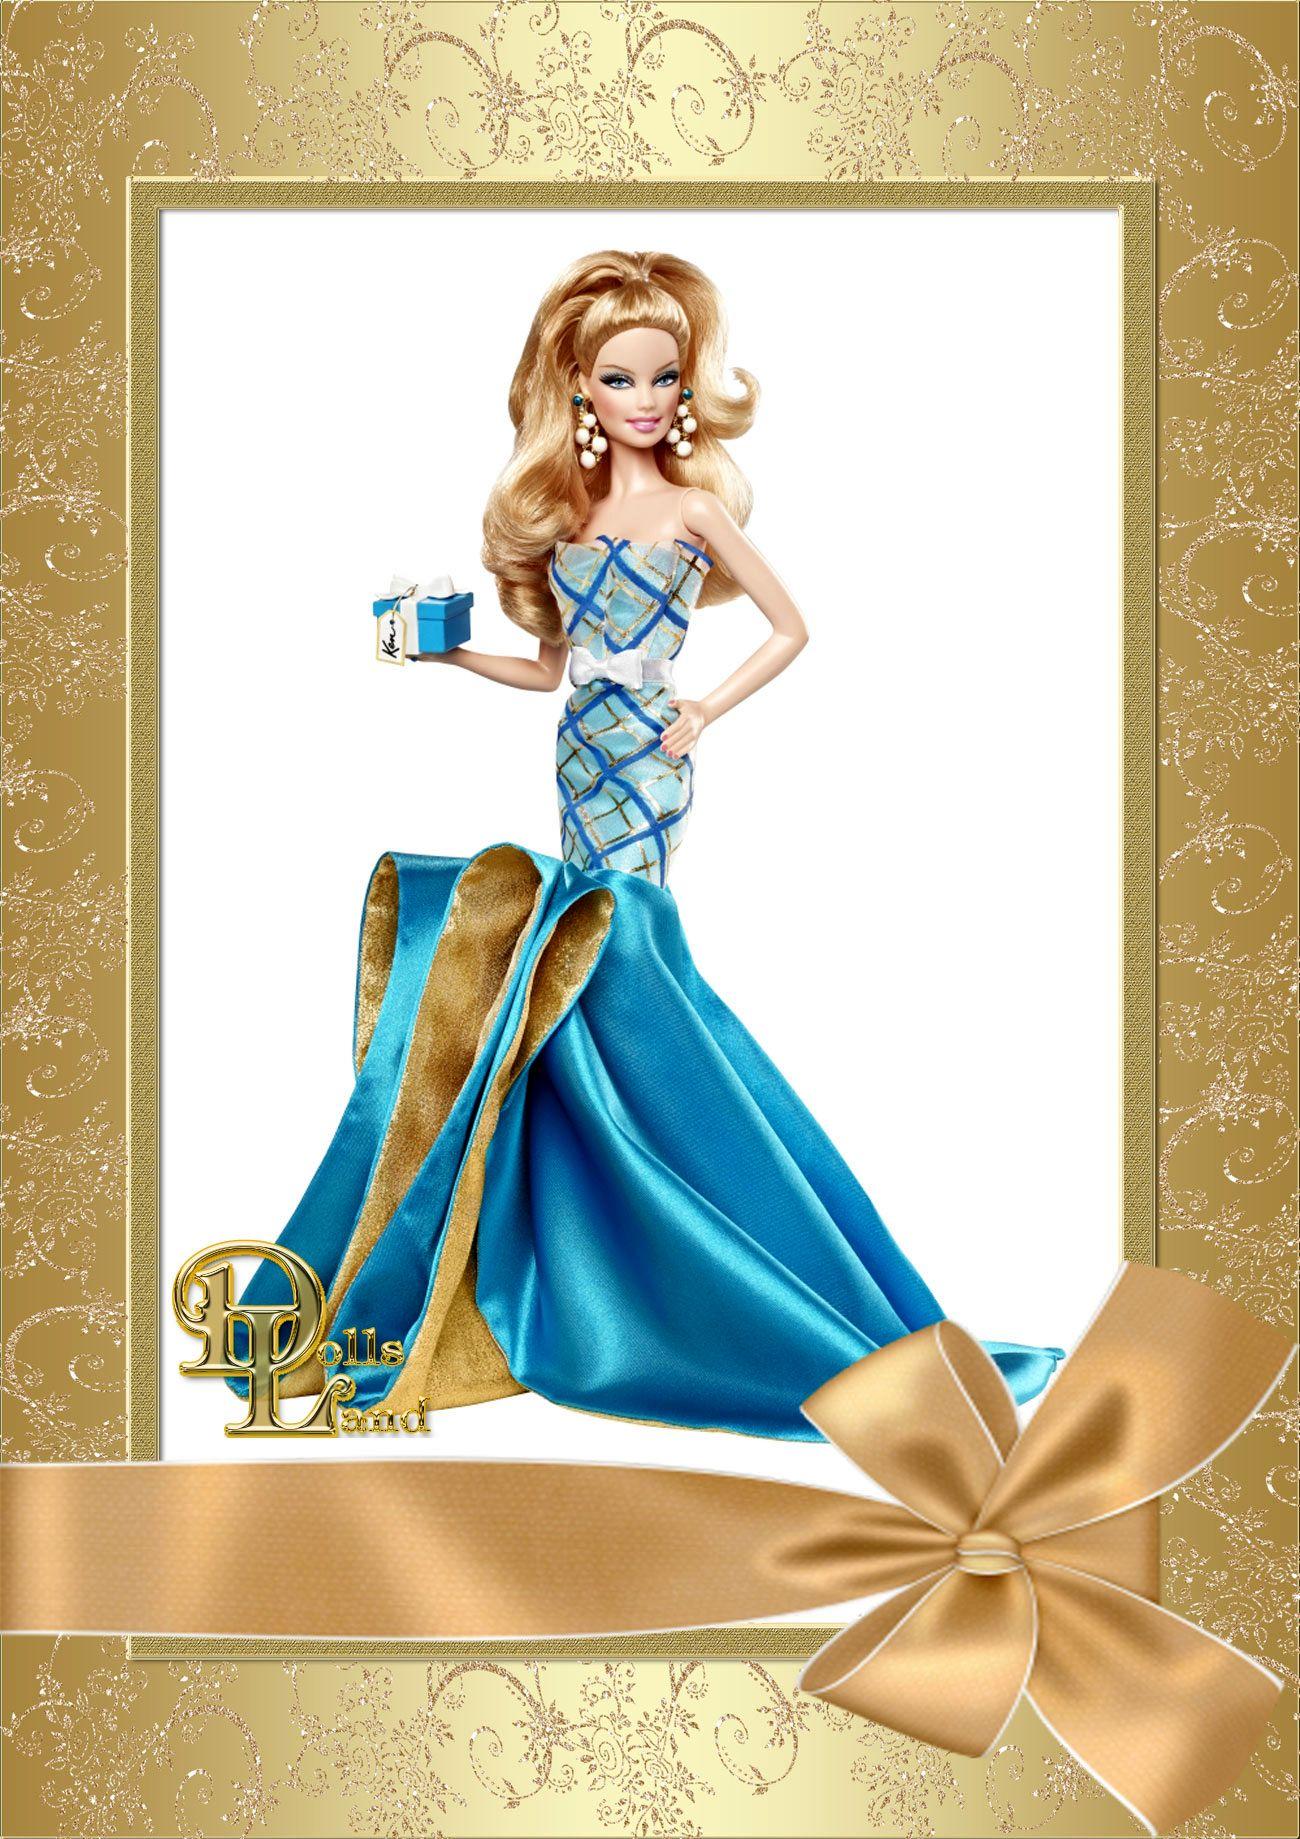 Коллекционные куклы Barbie